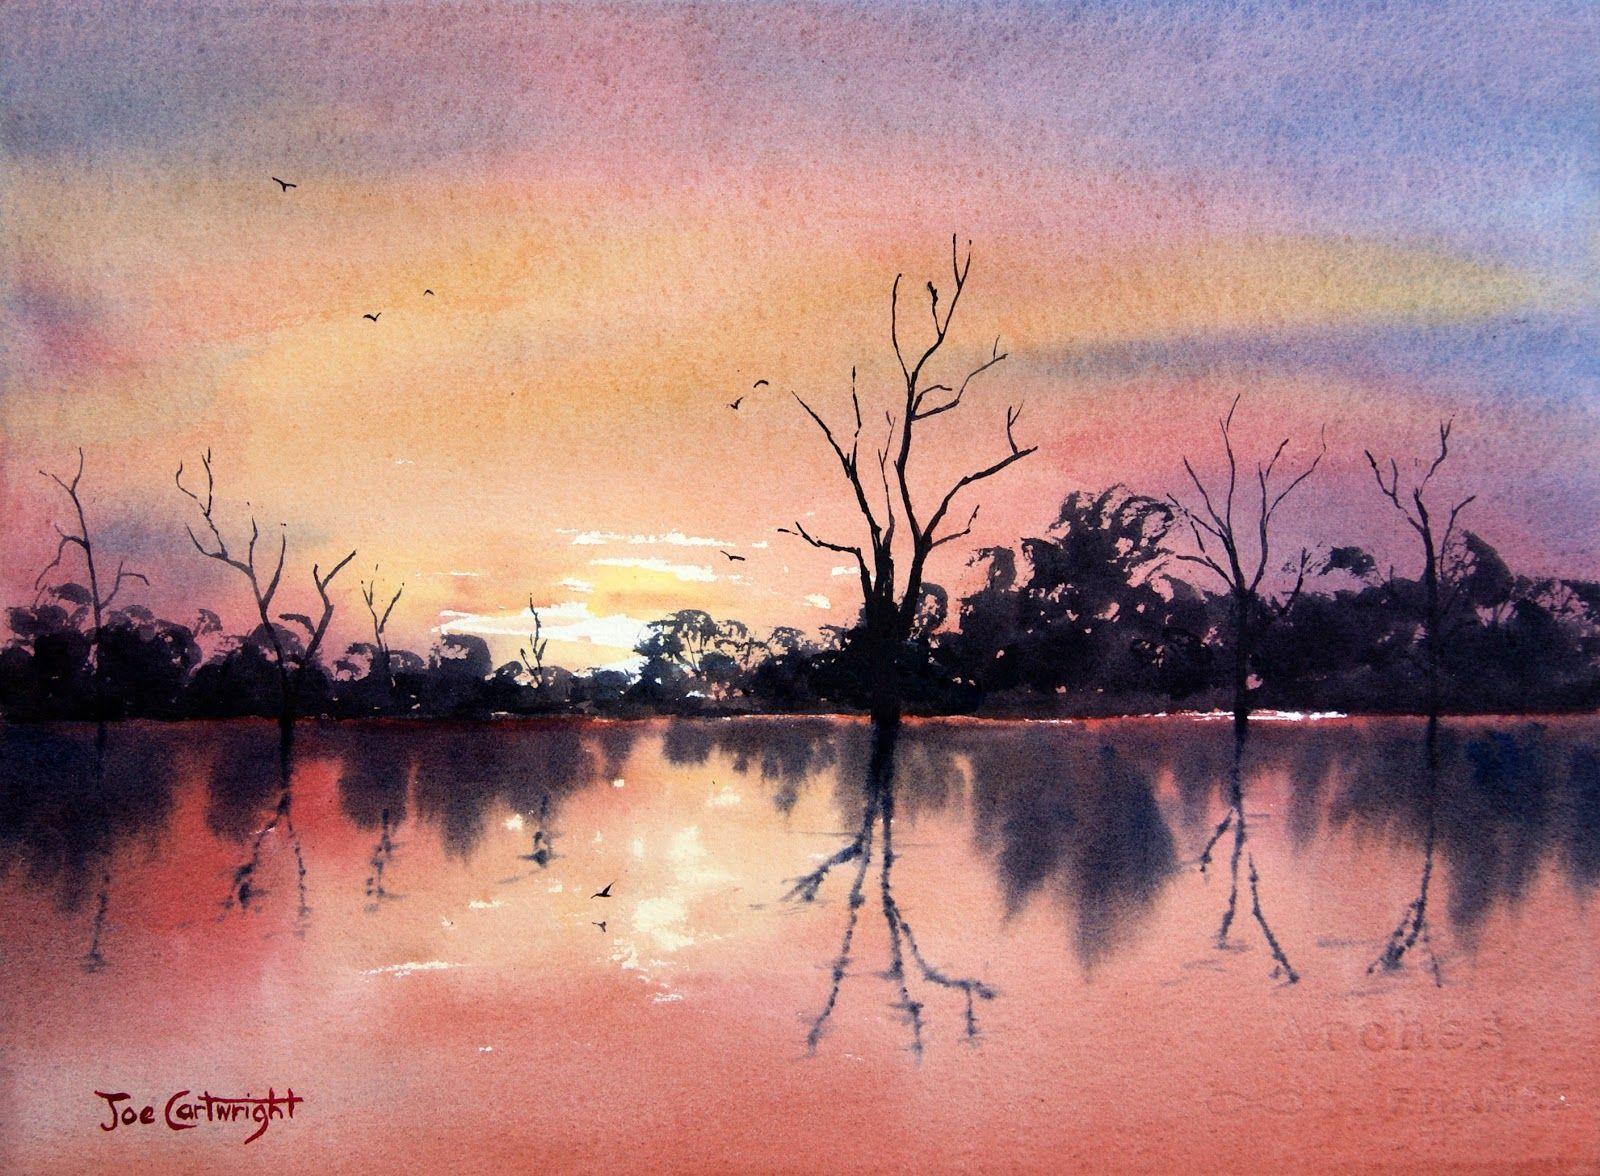 Easy Watercolor Paintings | Watercolor painting of